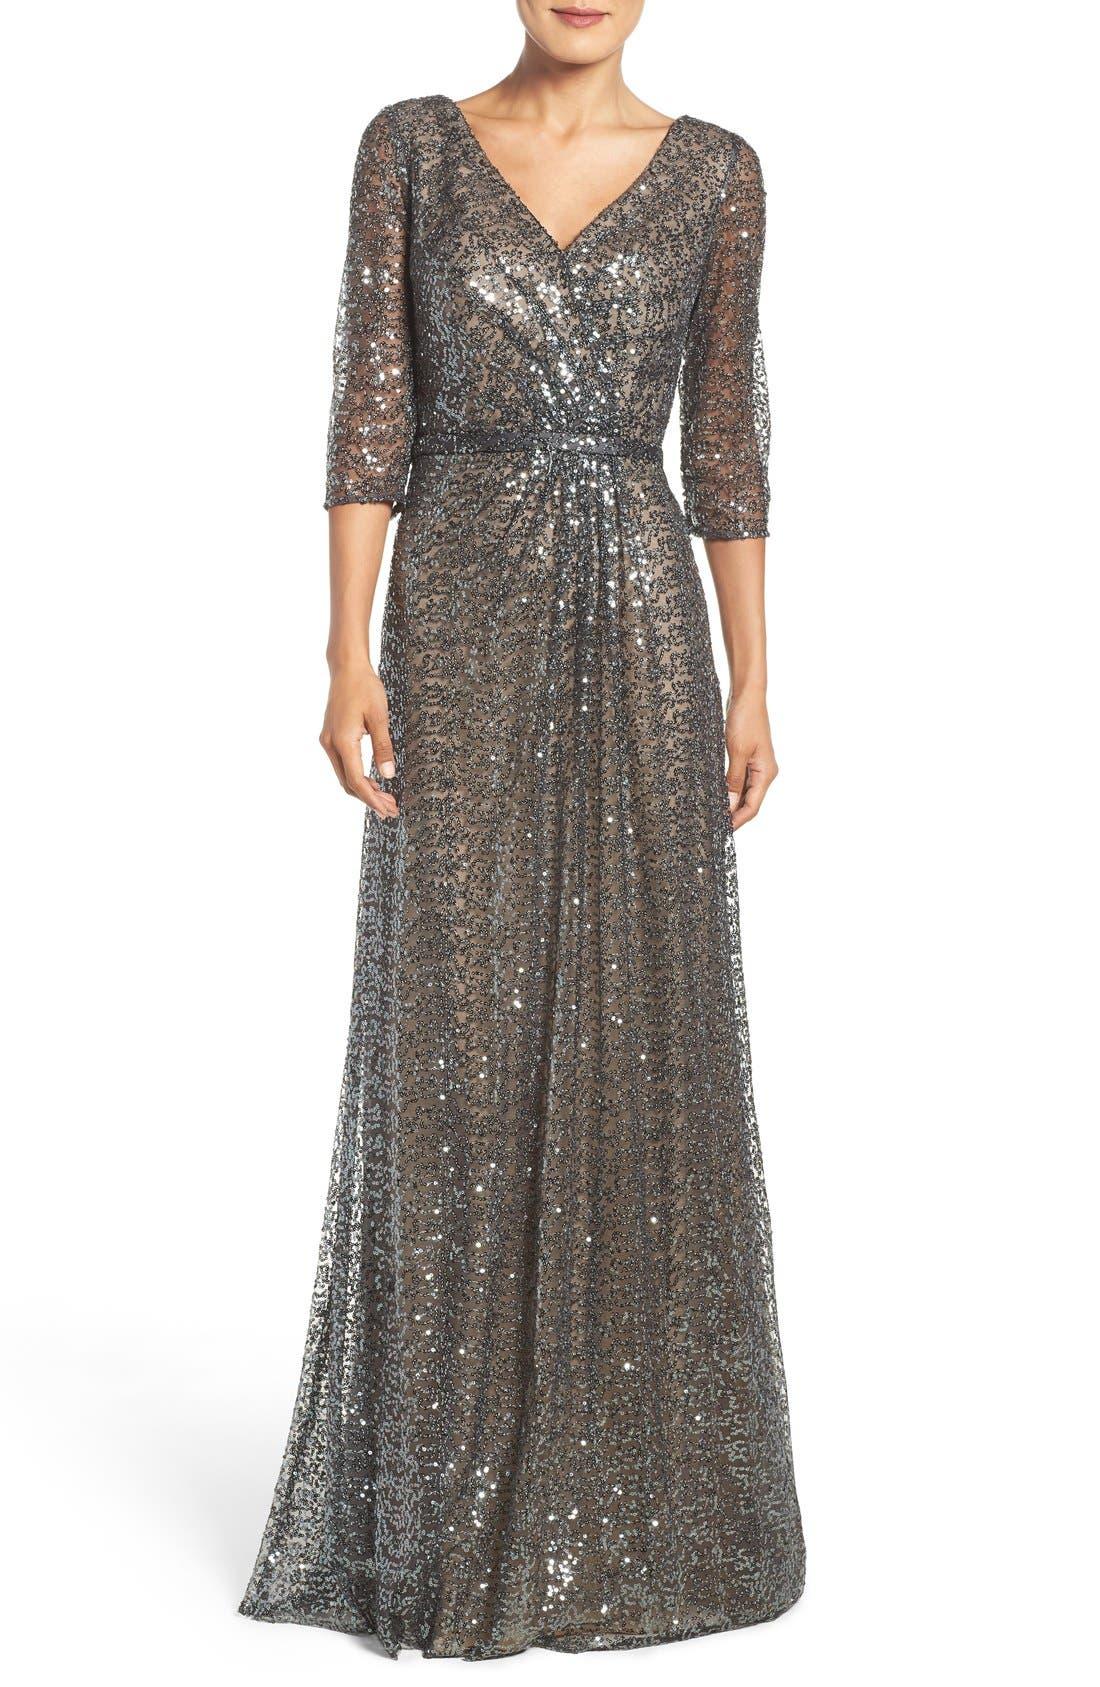 Alternate Image 1 Selected - La Femme Sequin Mesh Gown